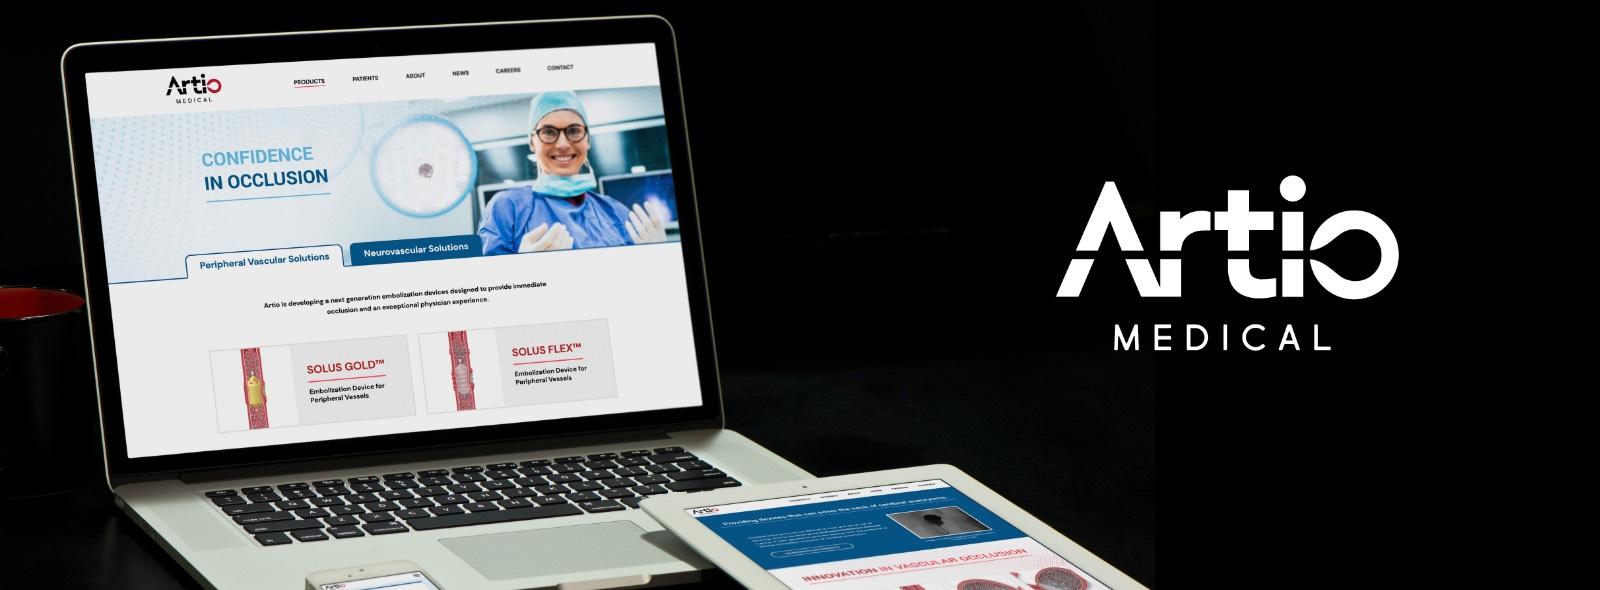 Artio Medical Website Header